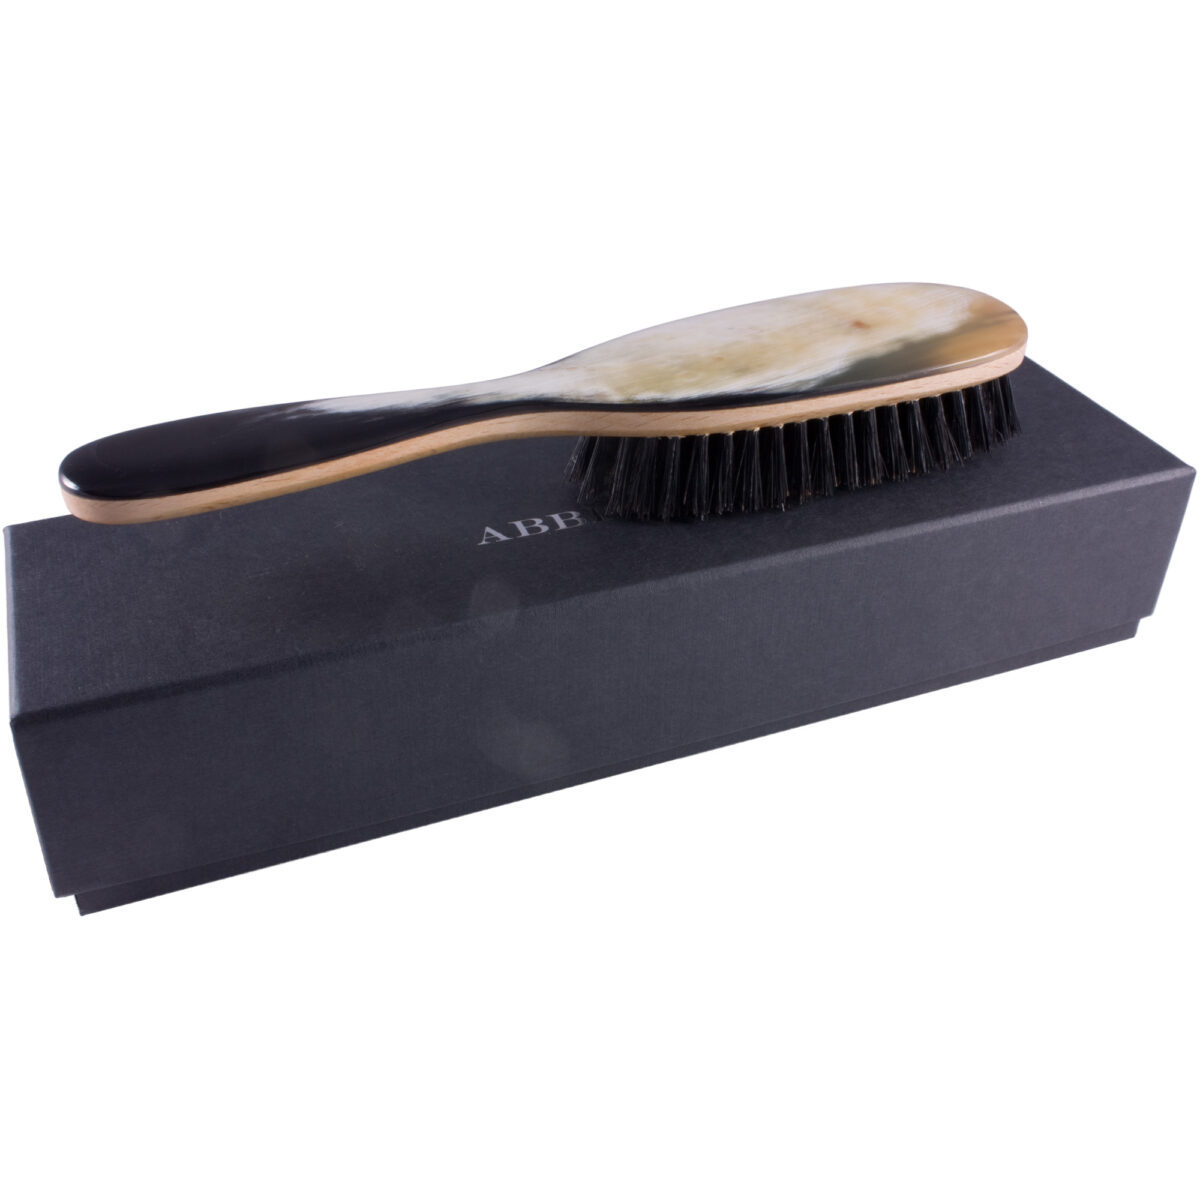 Abbeyhorn Hair Brush